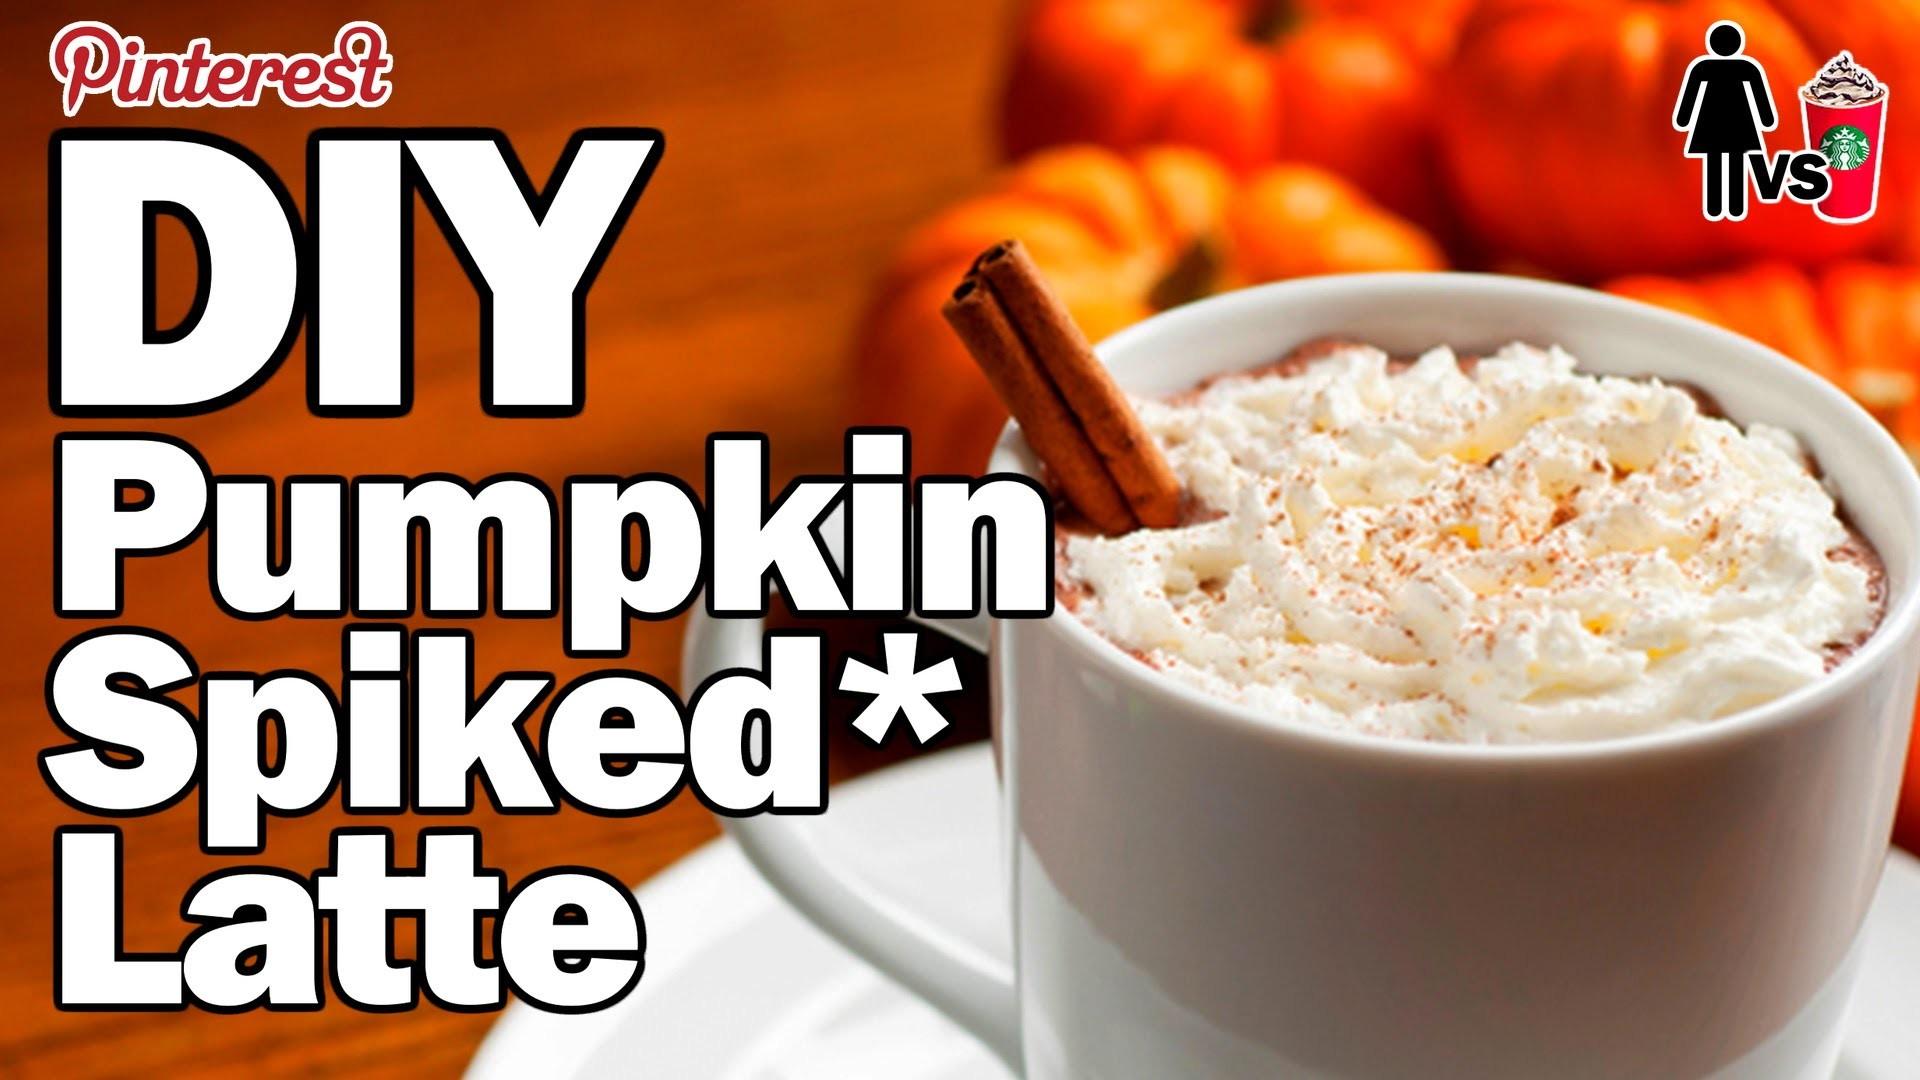 DIY Pumpkin *Spiked Latte - Corinne vs Starbucks Ep.1